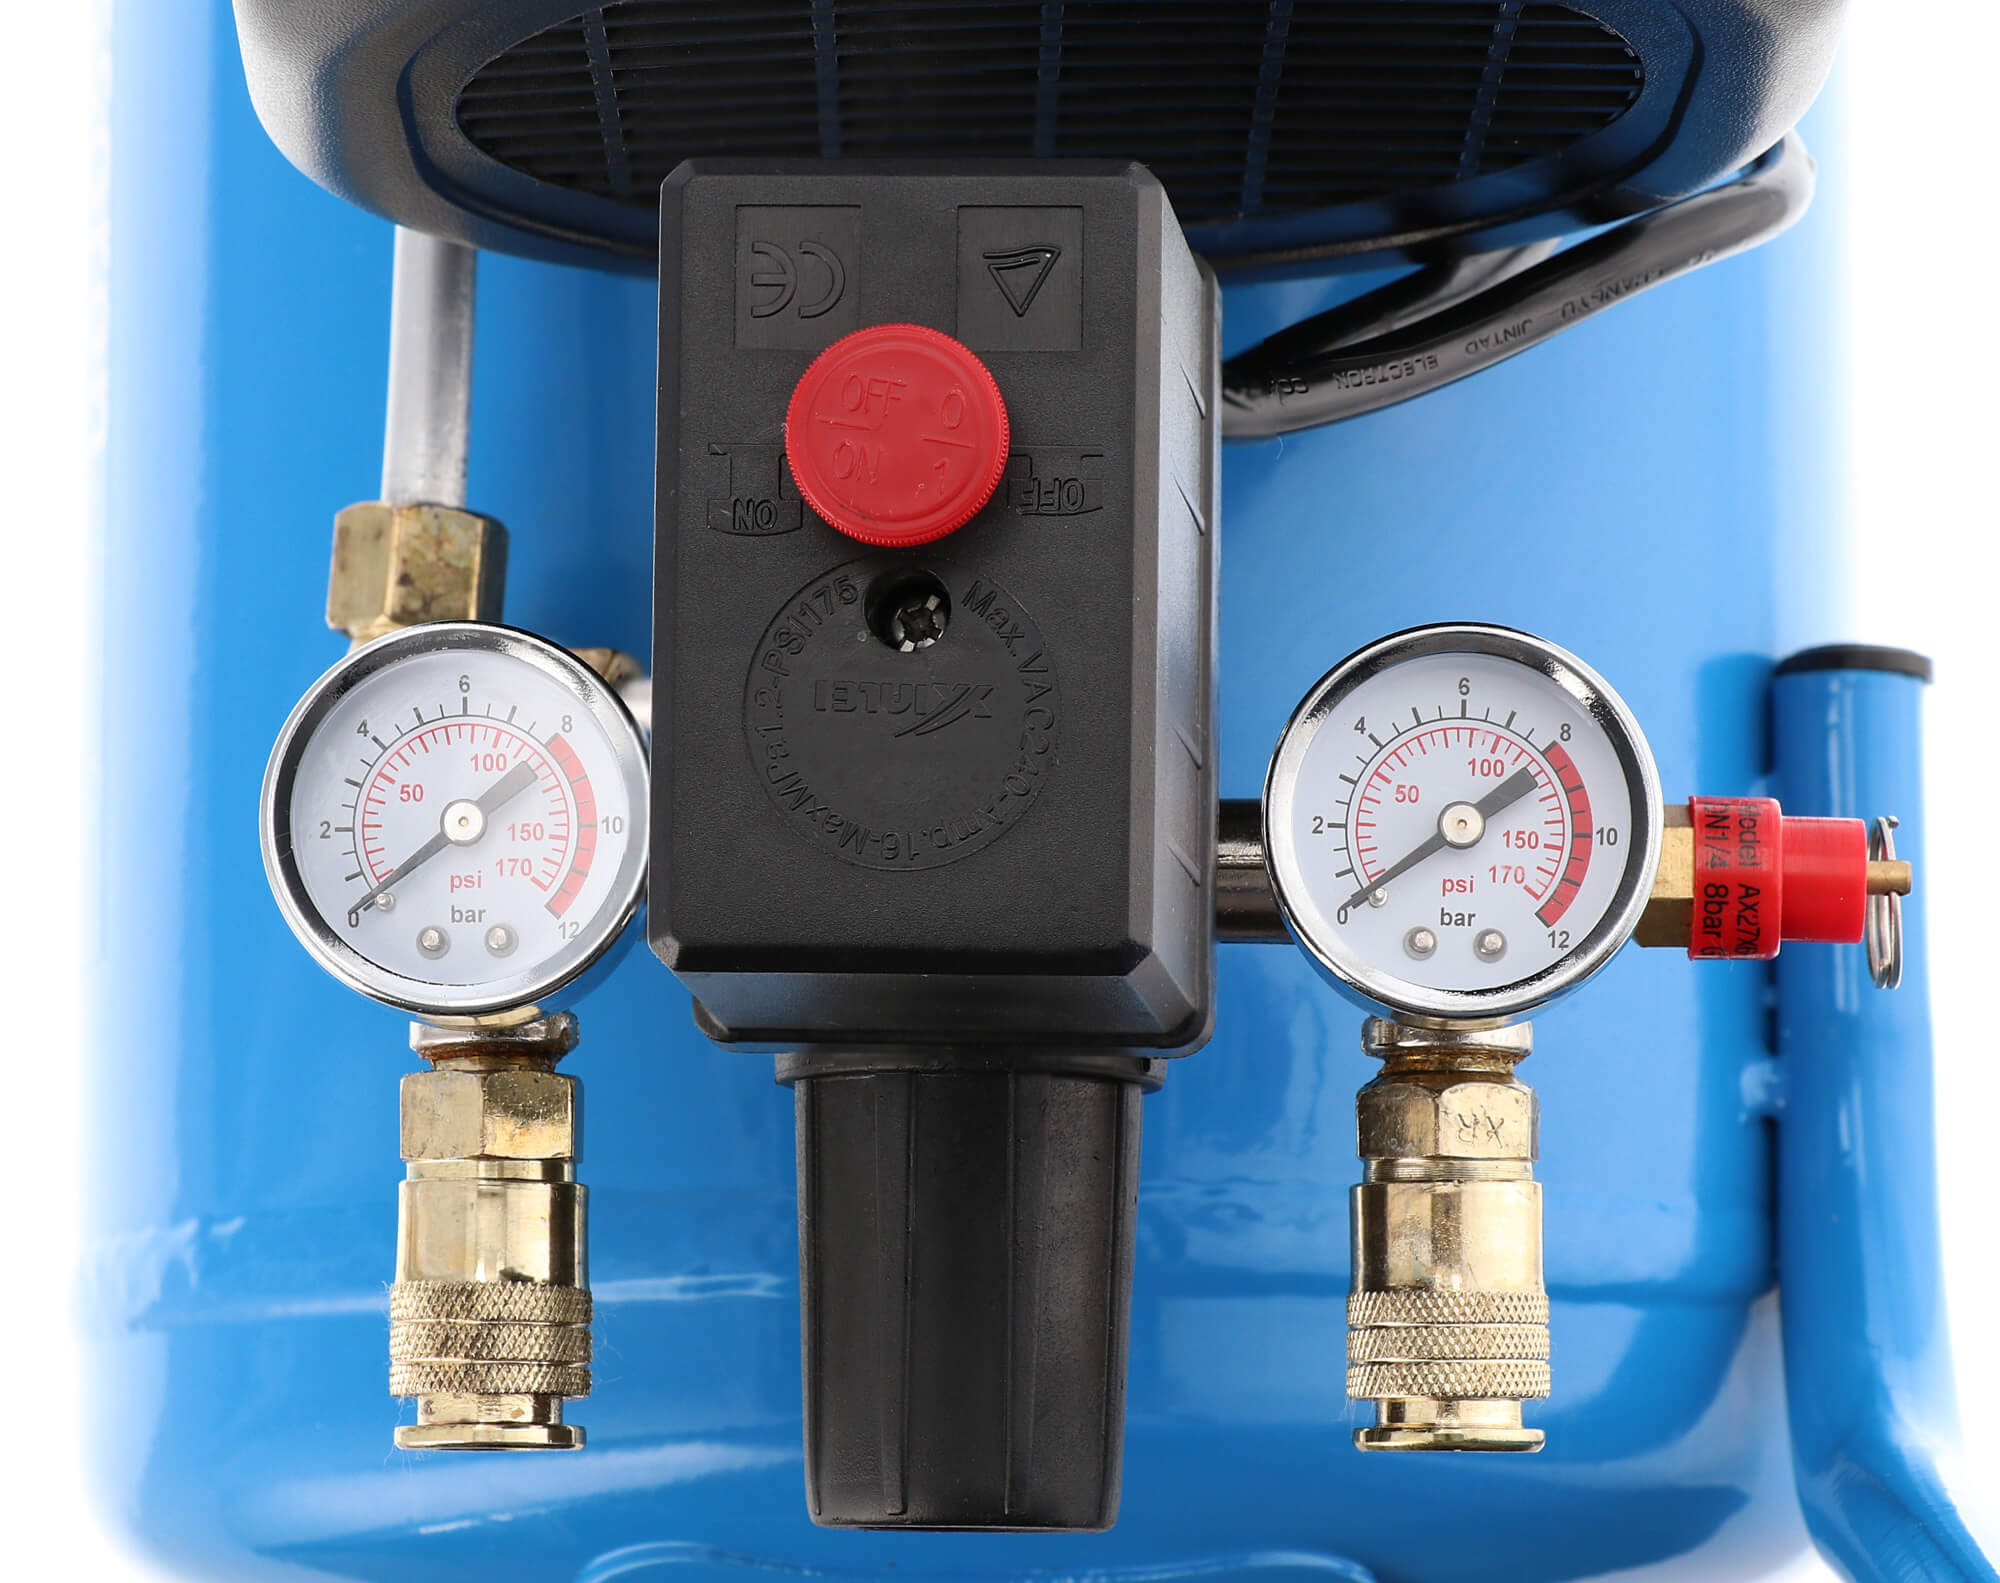 Airpress Kompressor HL 310-25 Druckschalter Manometer